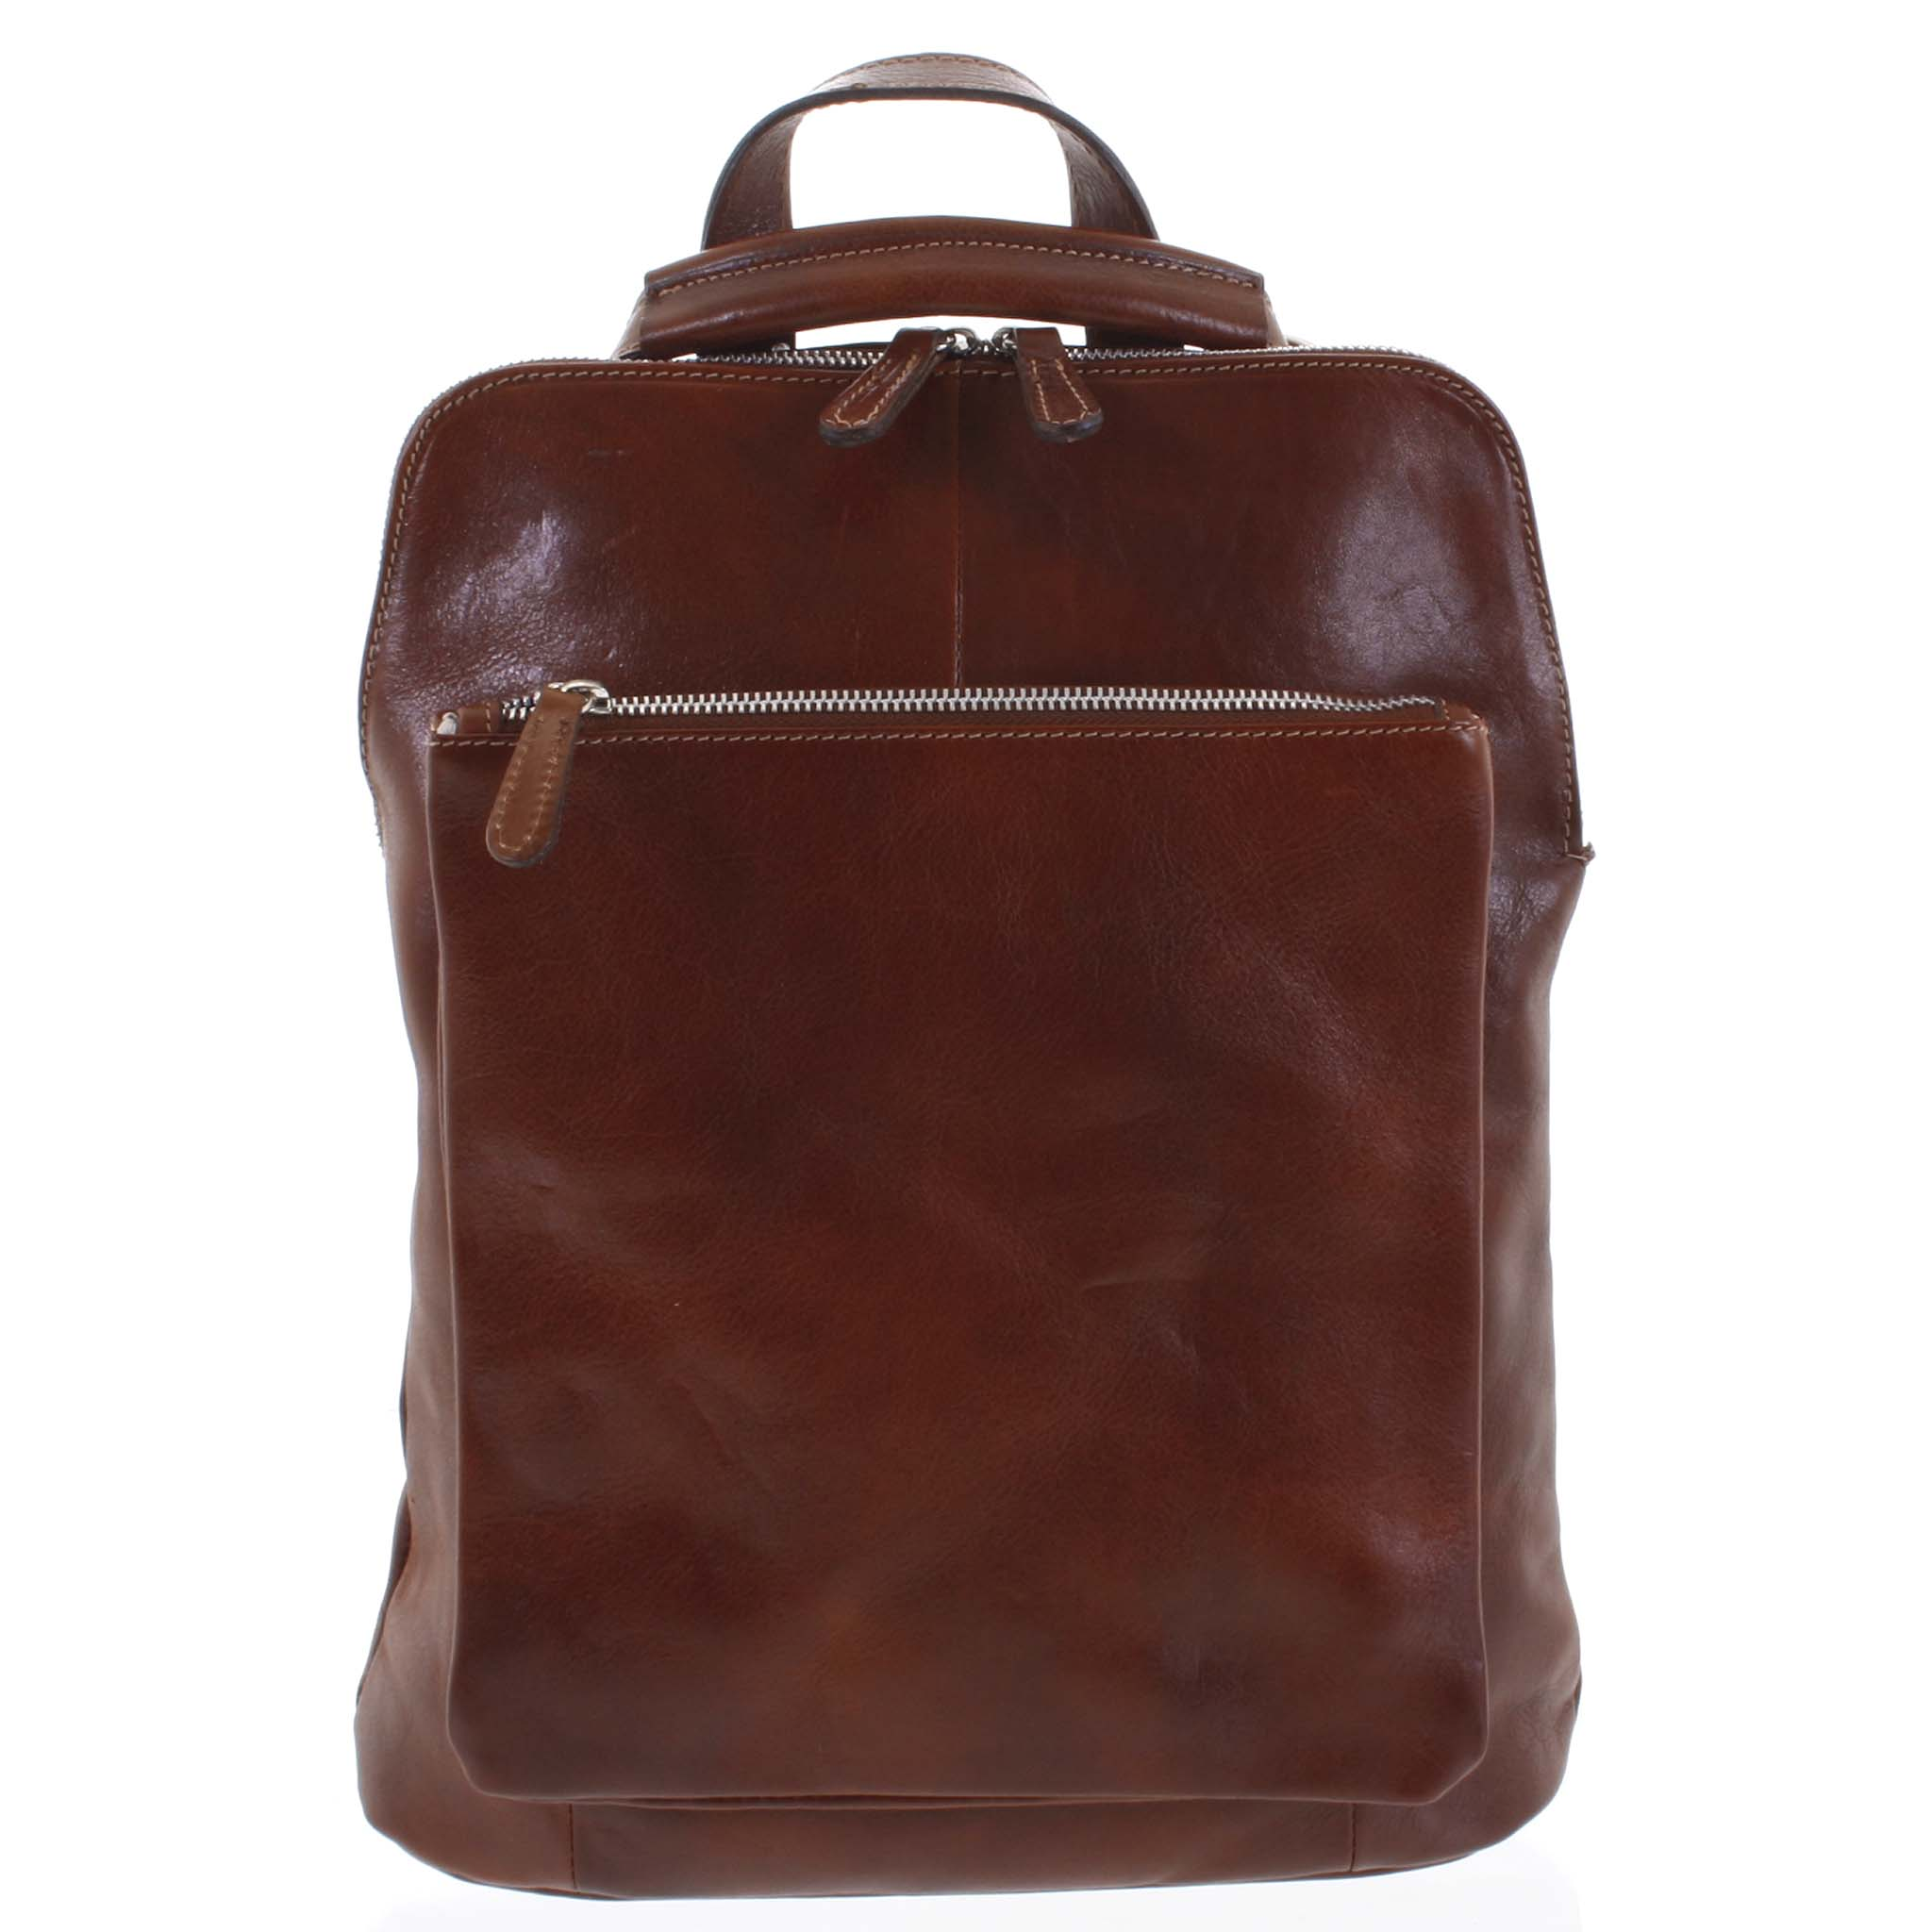 Dámsky kožený batoh kabelka hnedý - ItalY Englidis